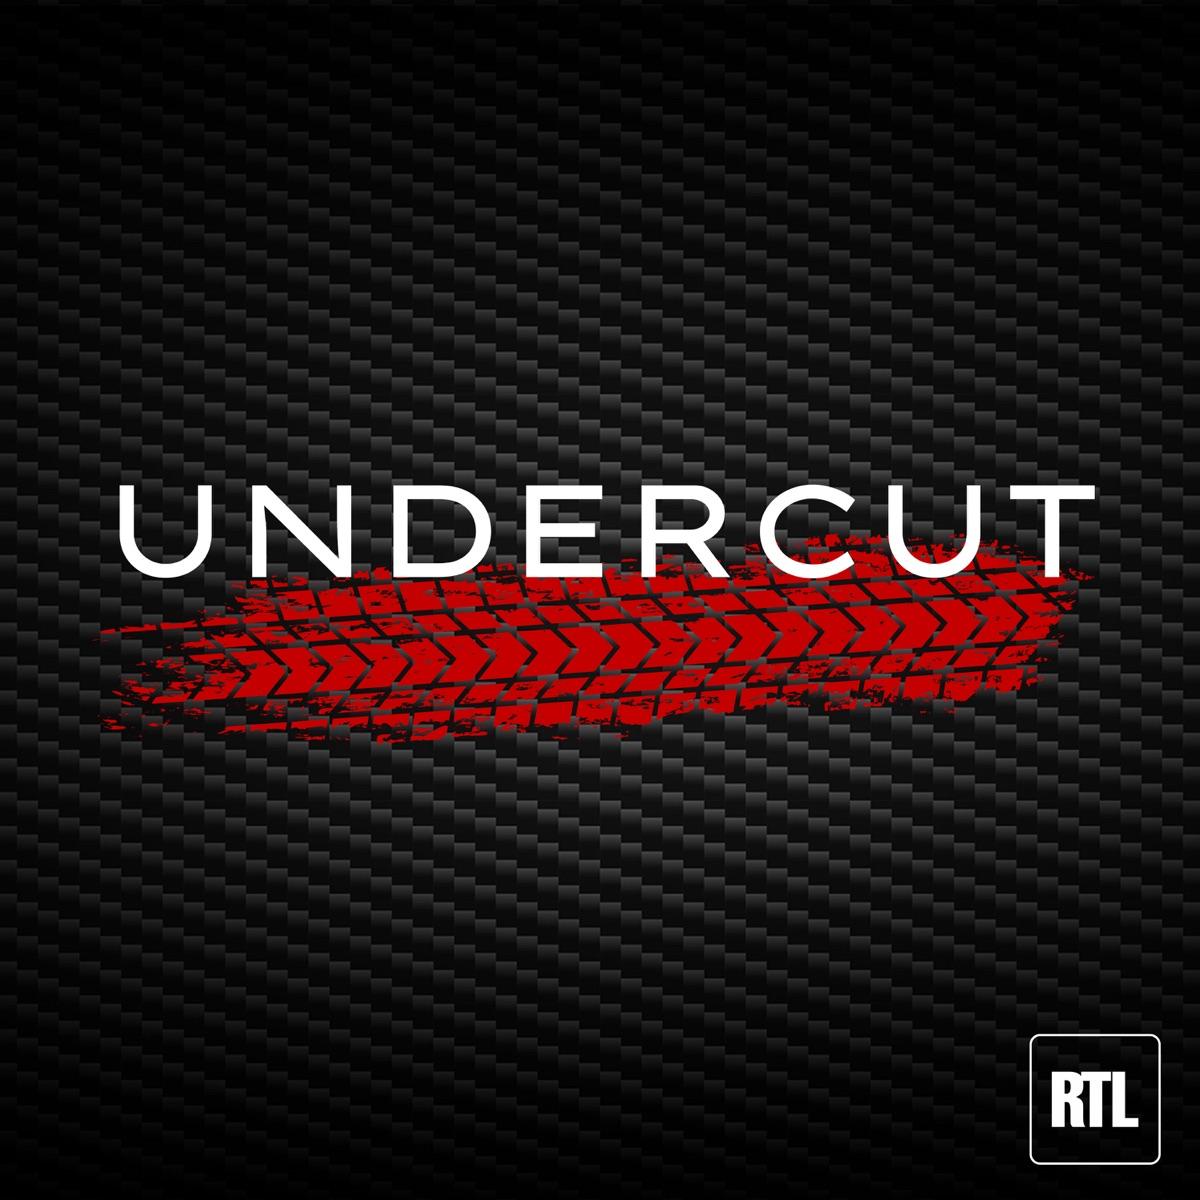 RTL - Undercut